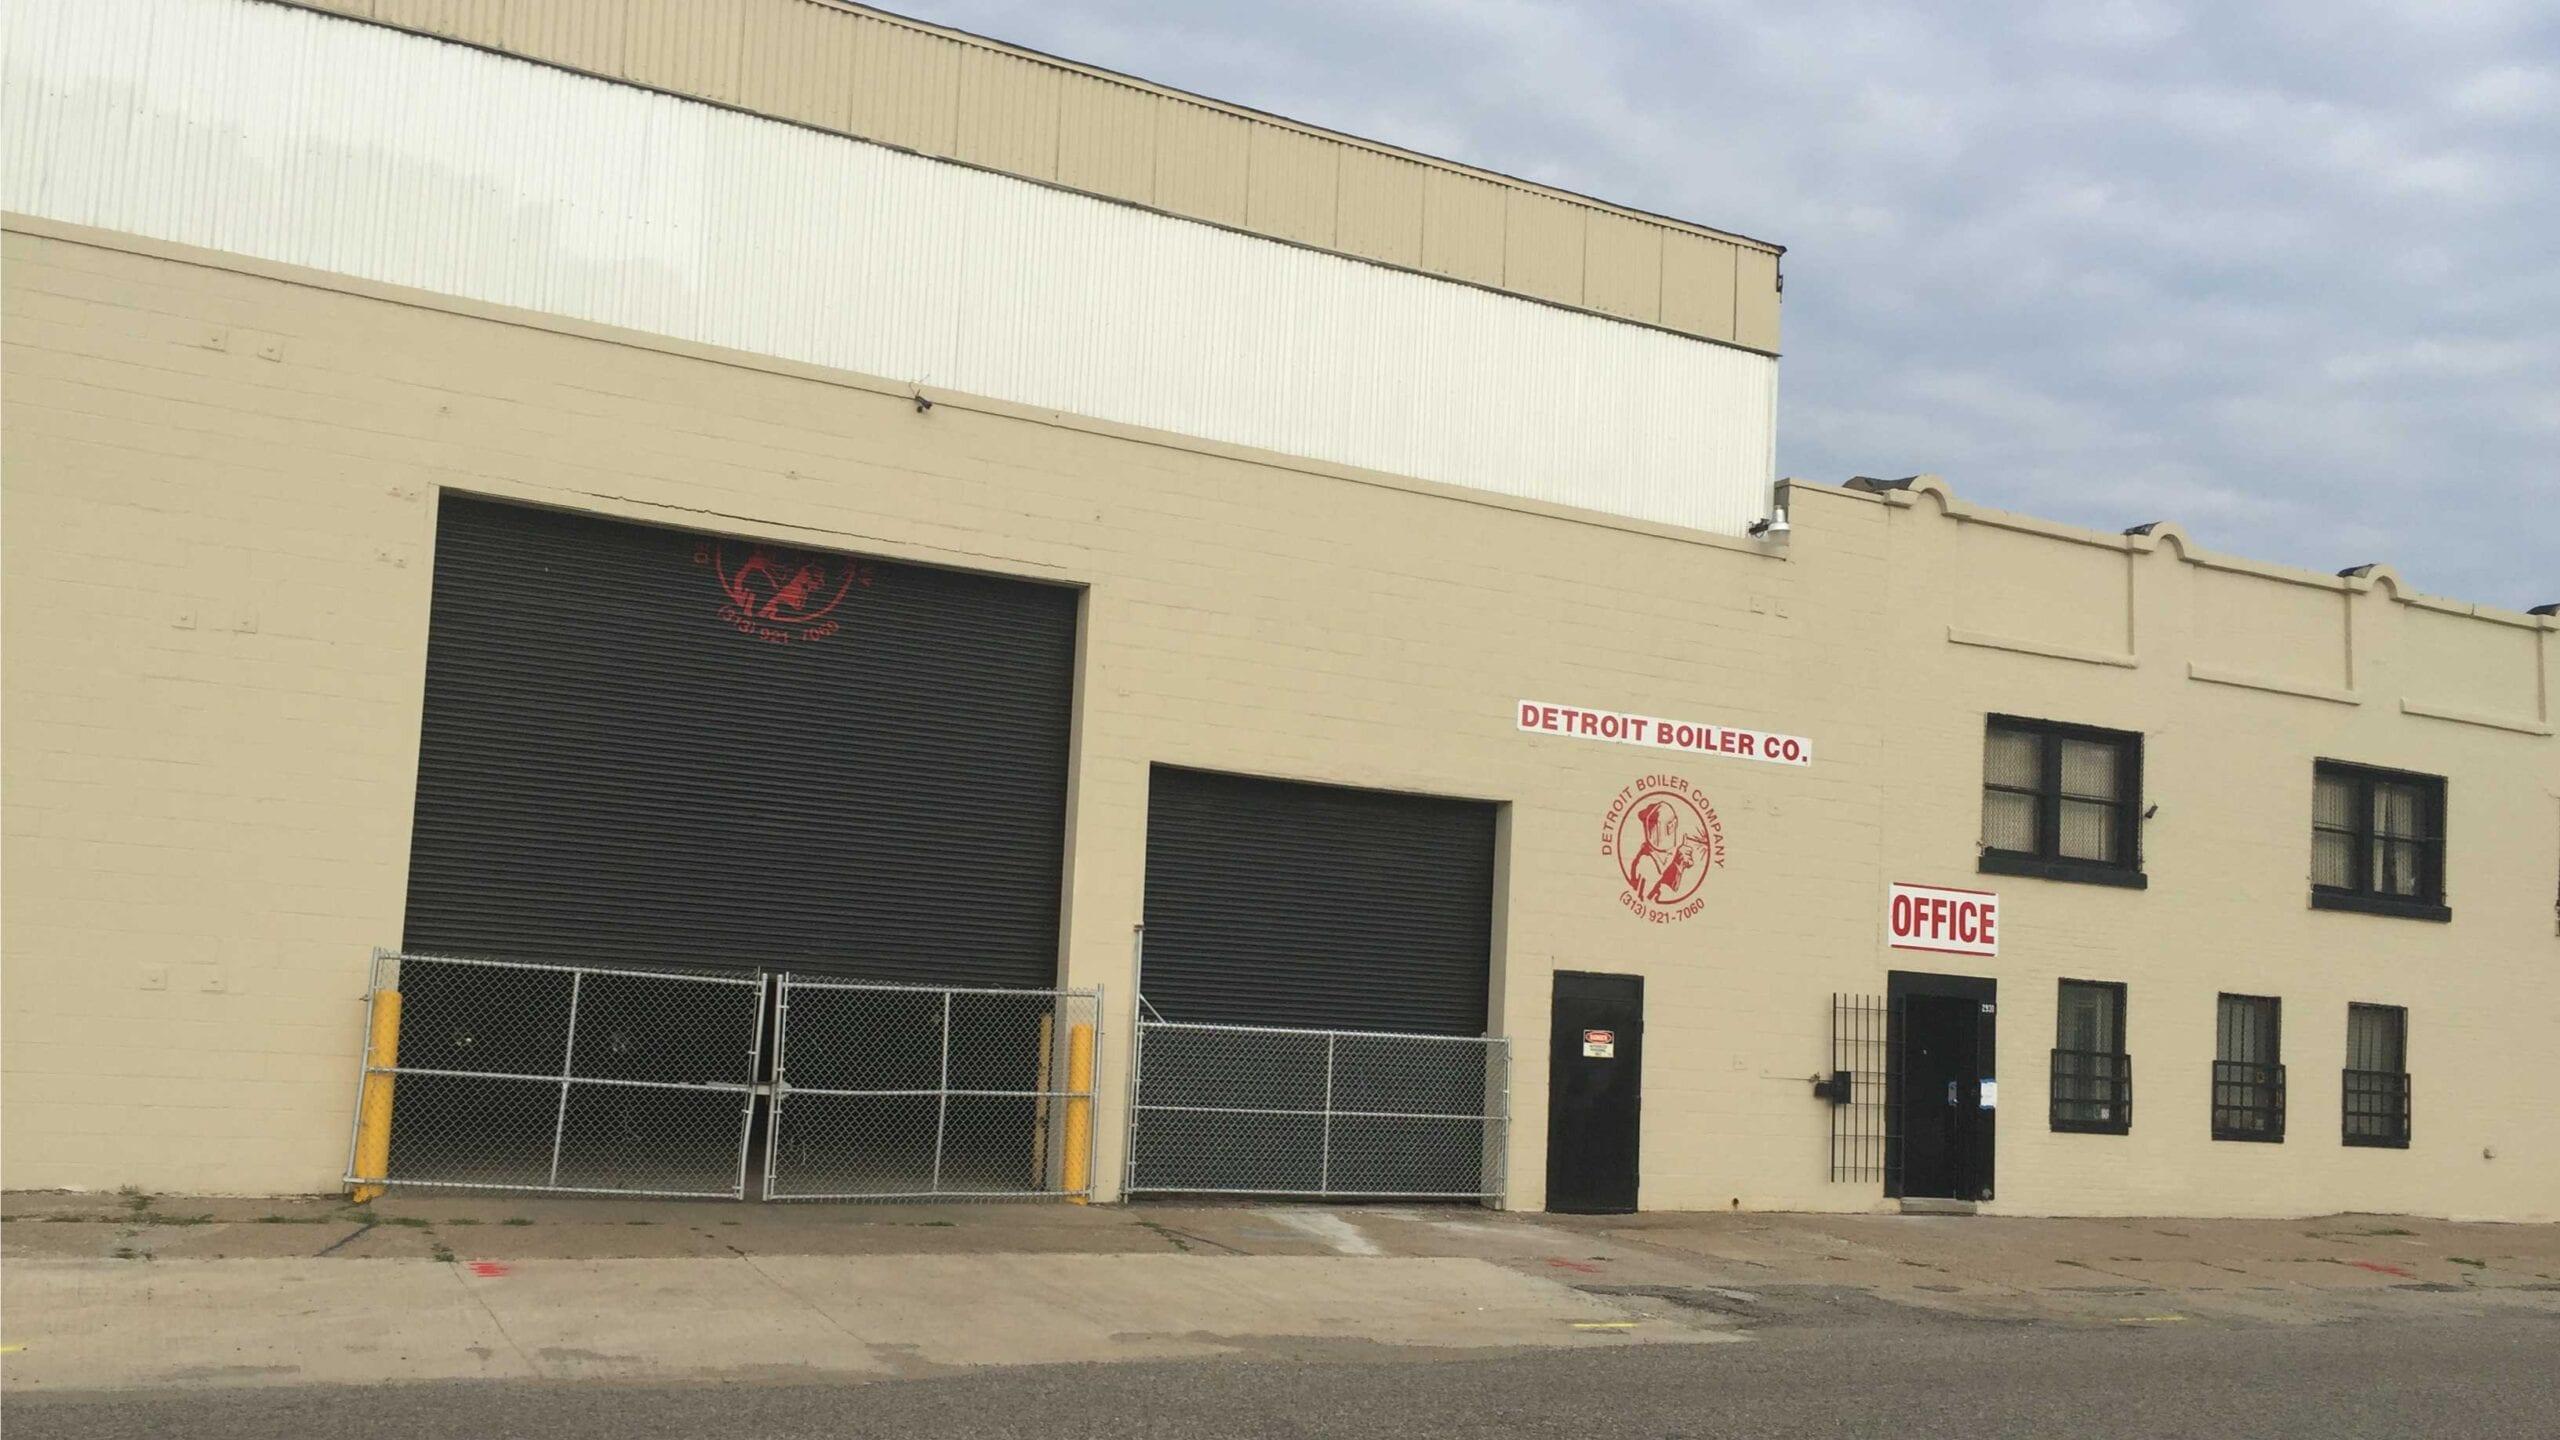 Detroit Boiler Company